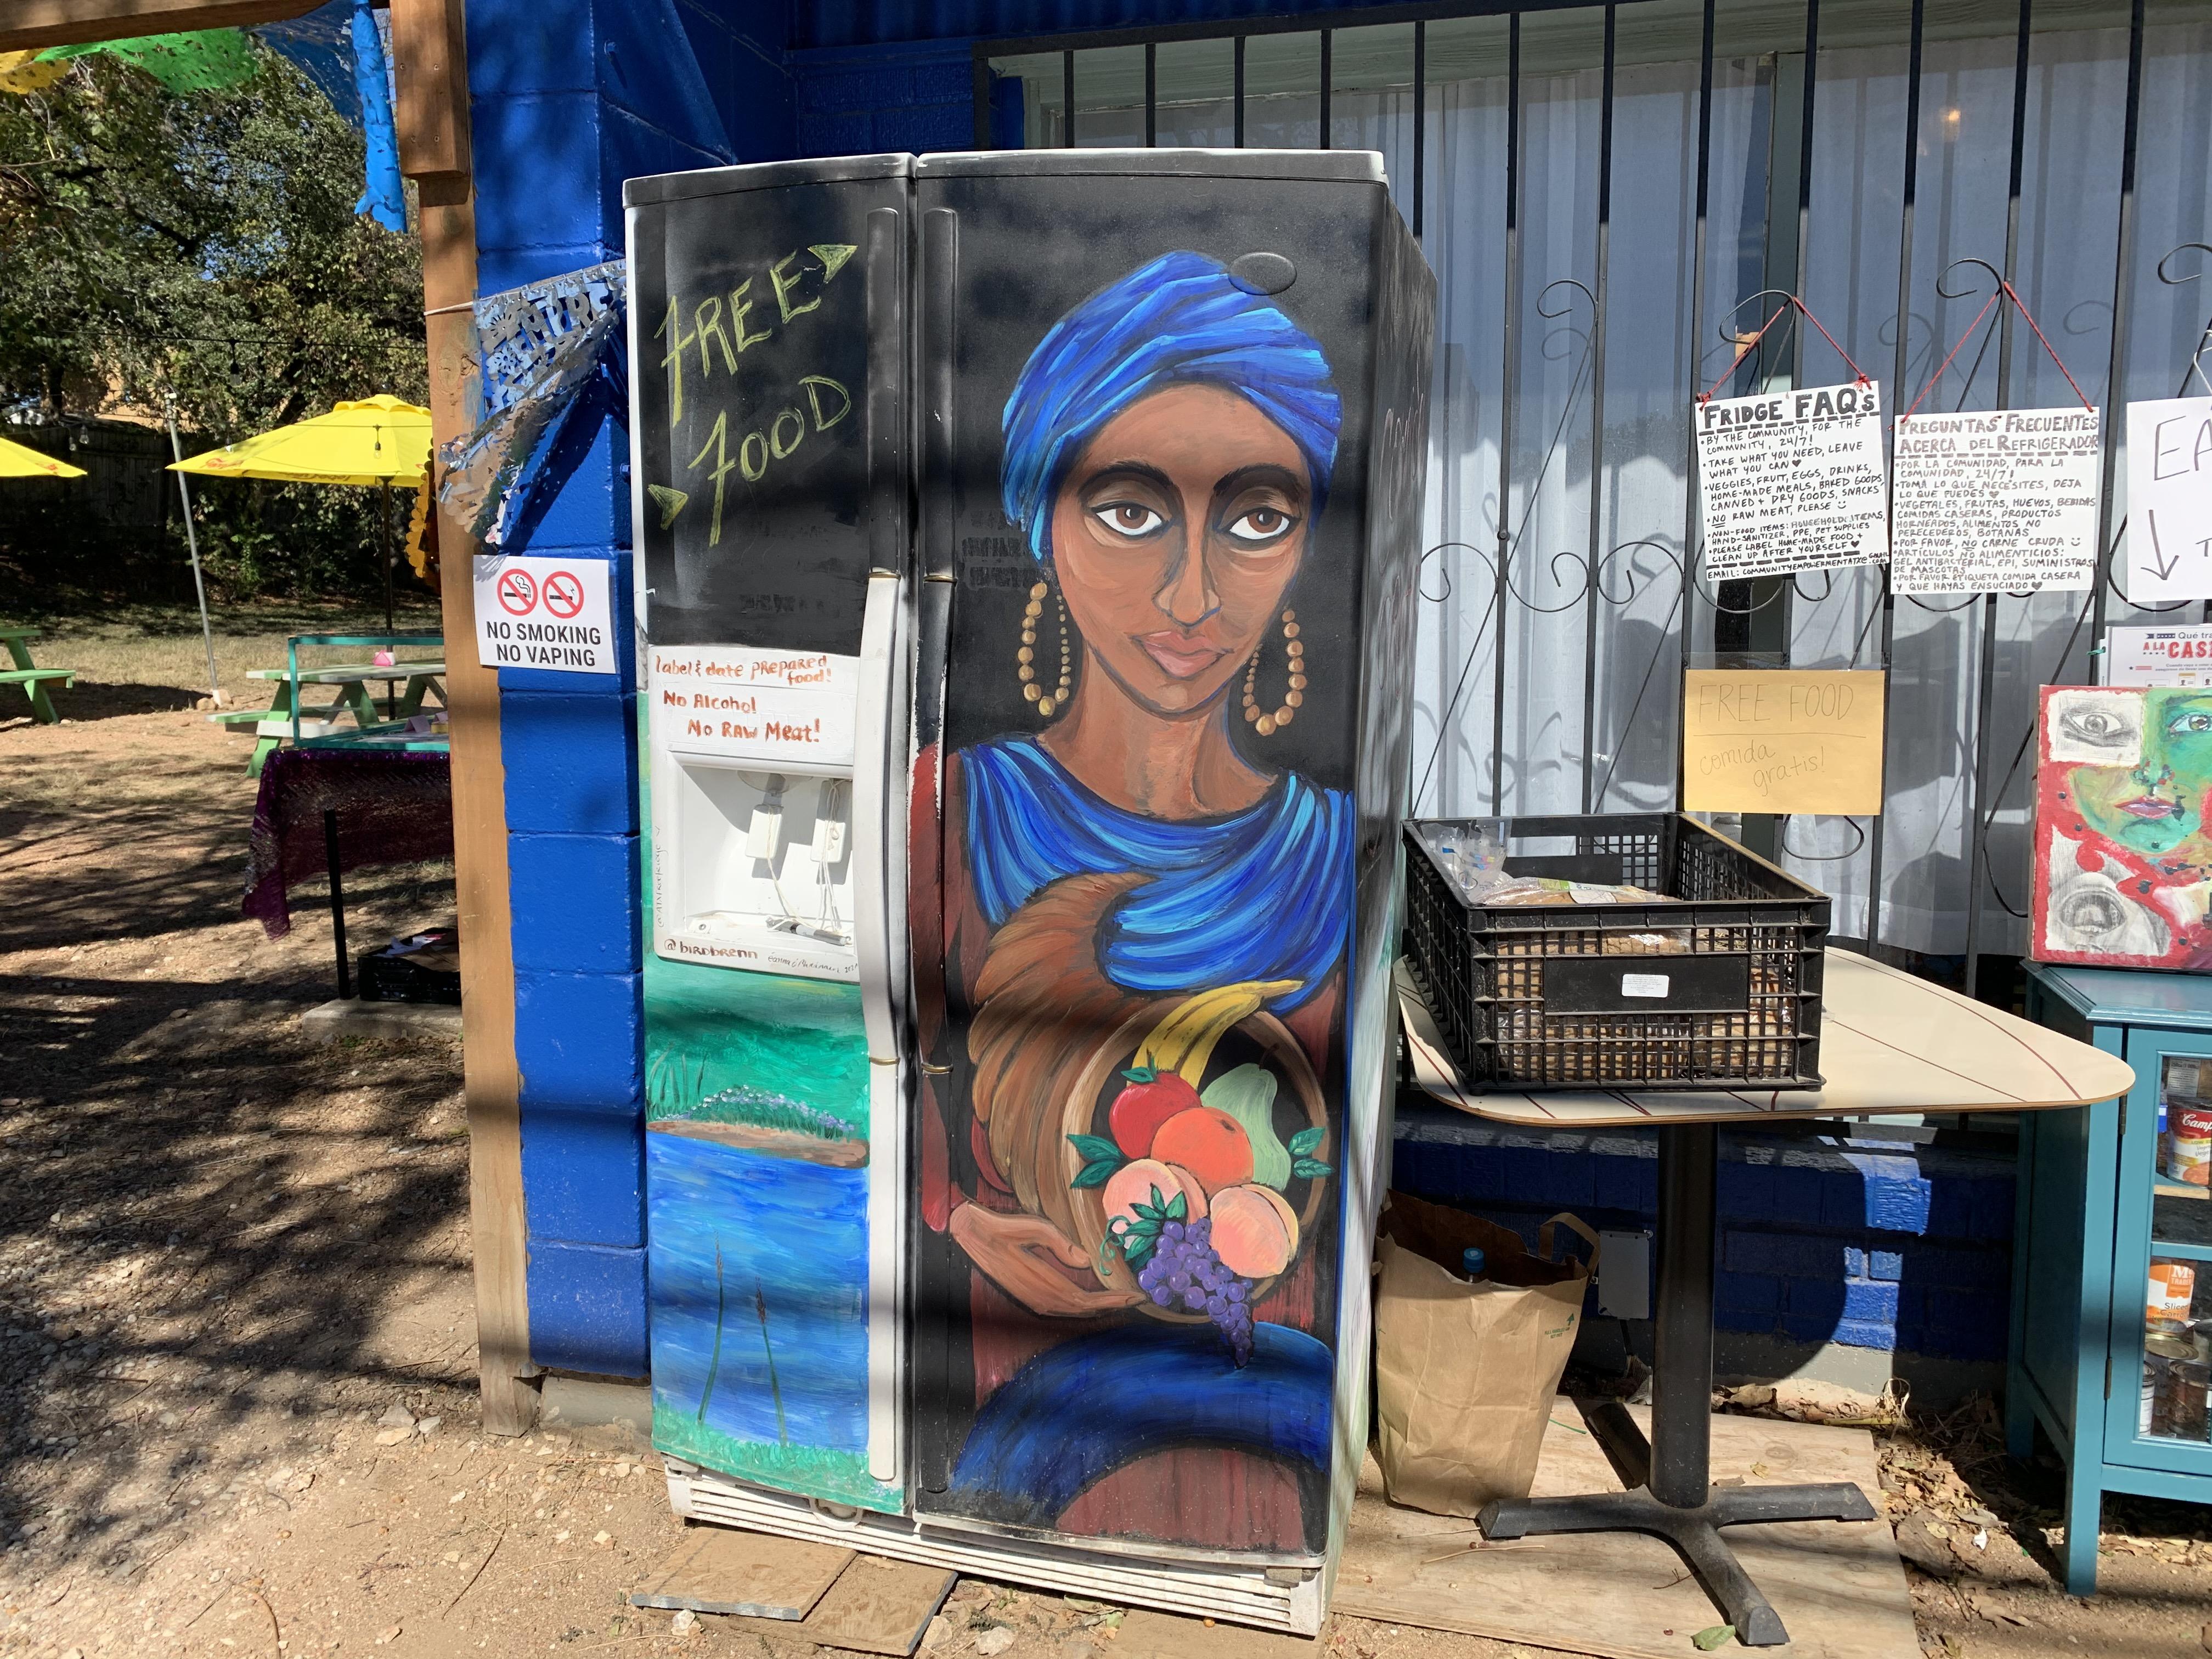 The community fridge at Nixta